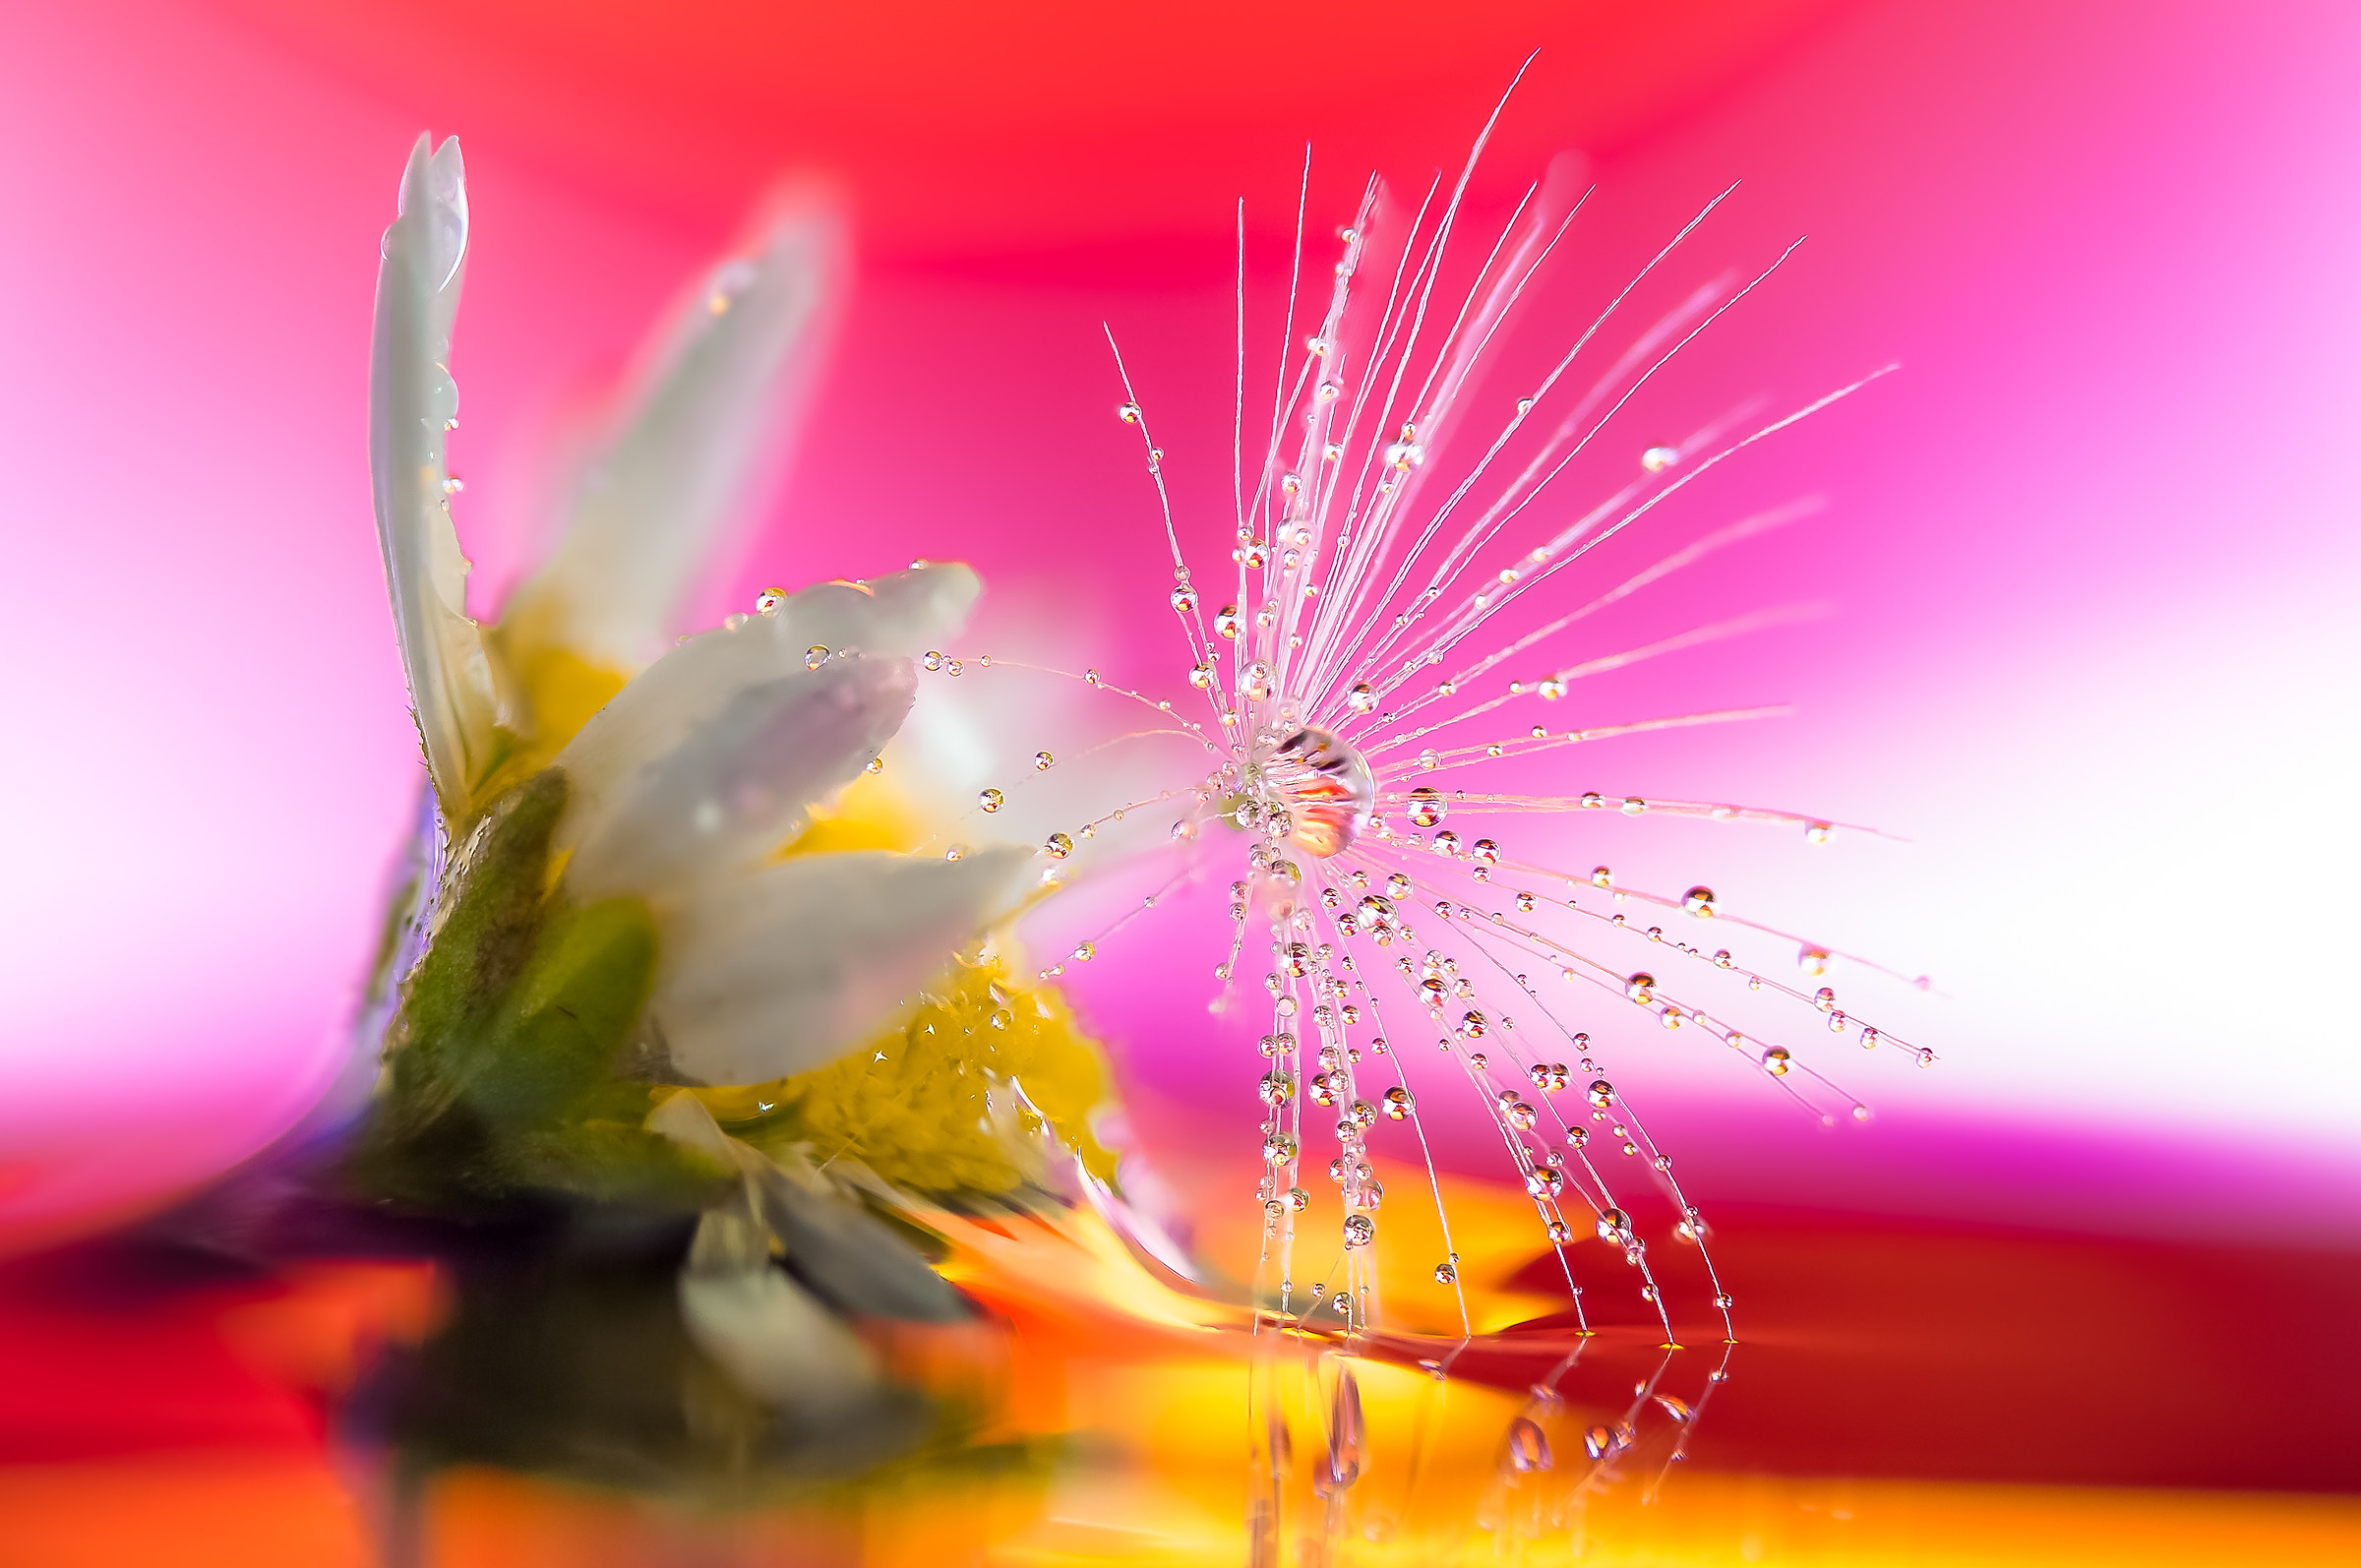 Drops Flowers Gocce Fiori Riflessi Mario Nicorelli...